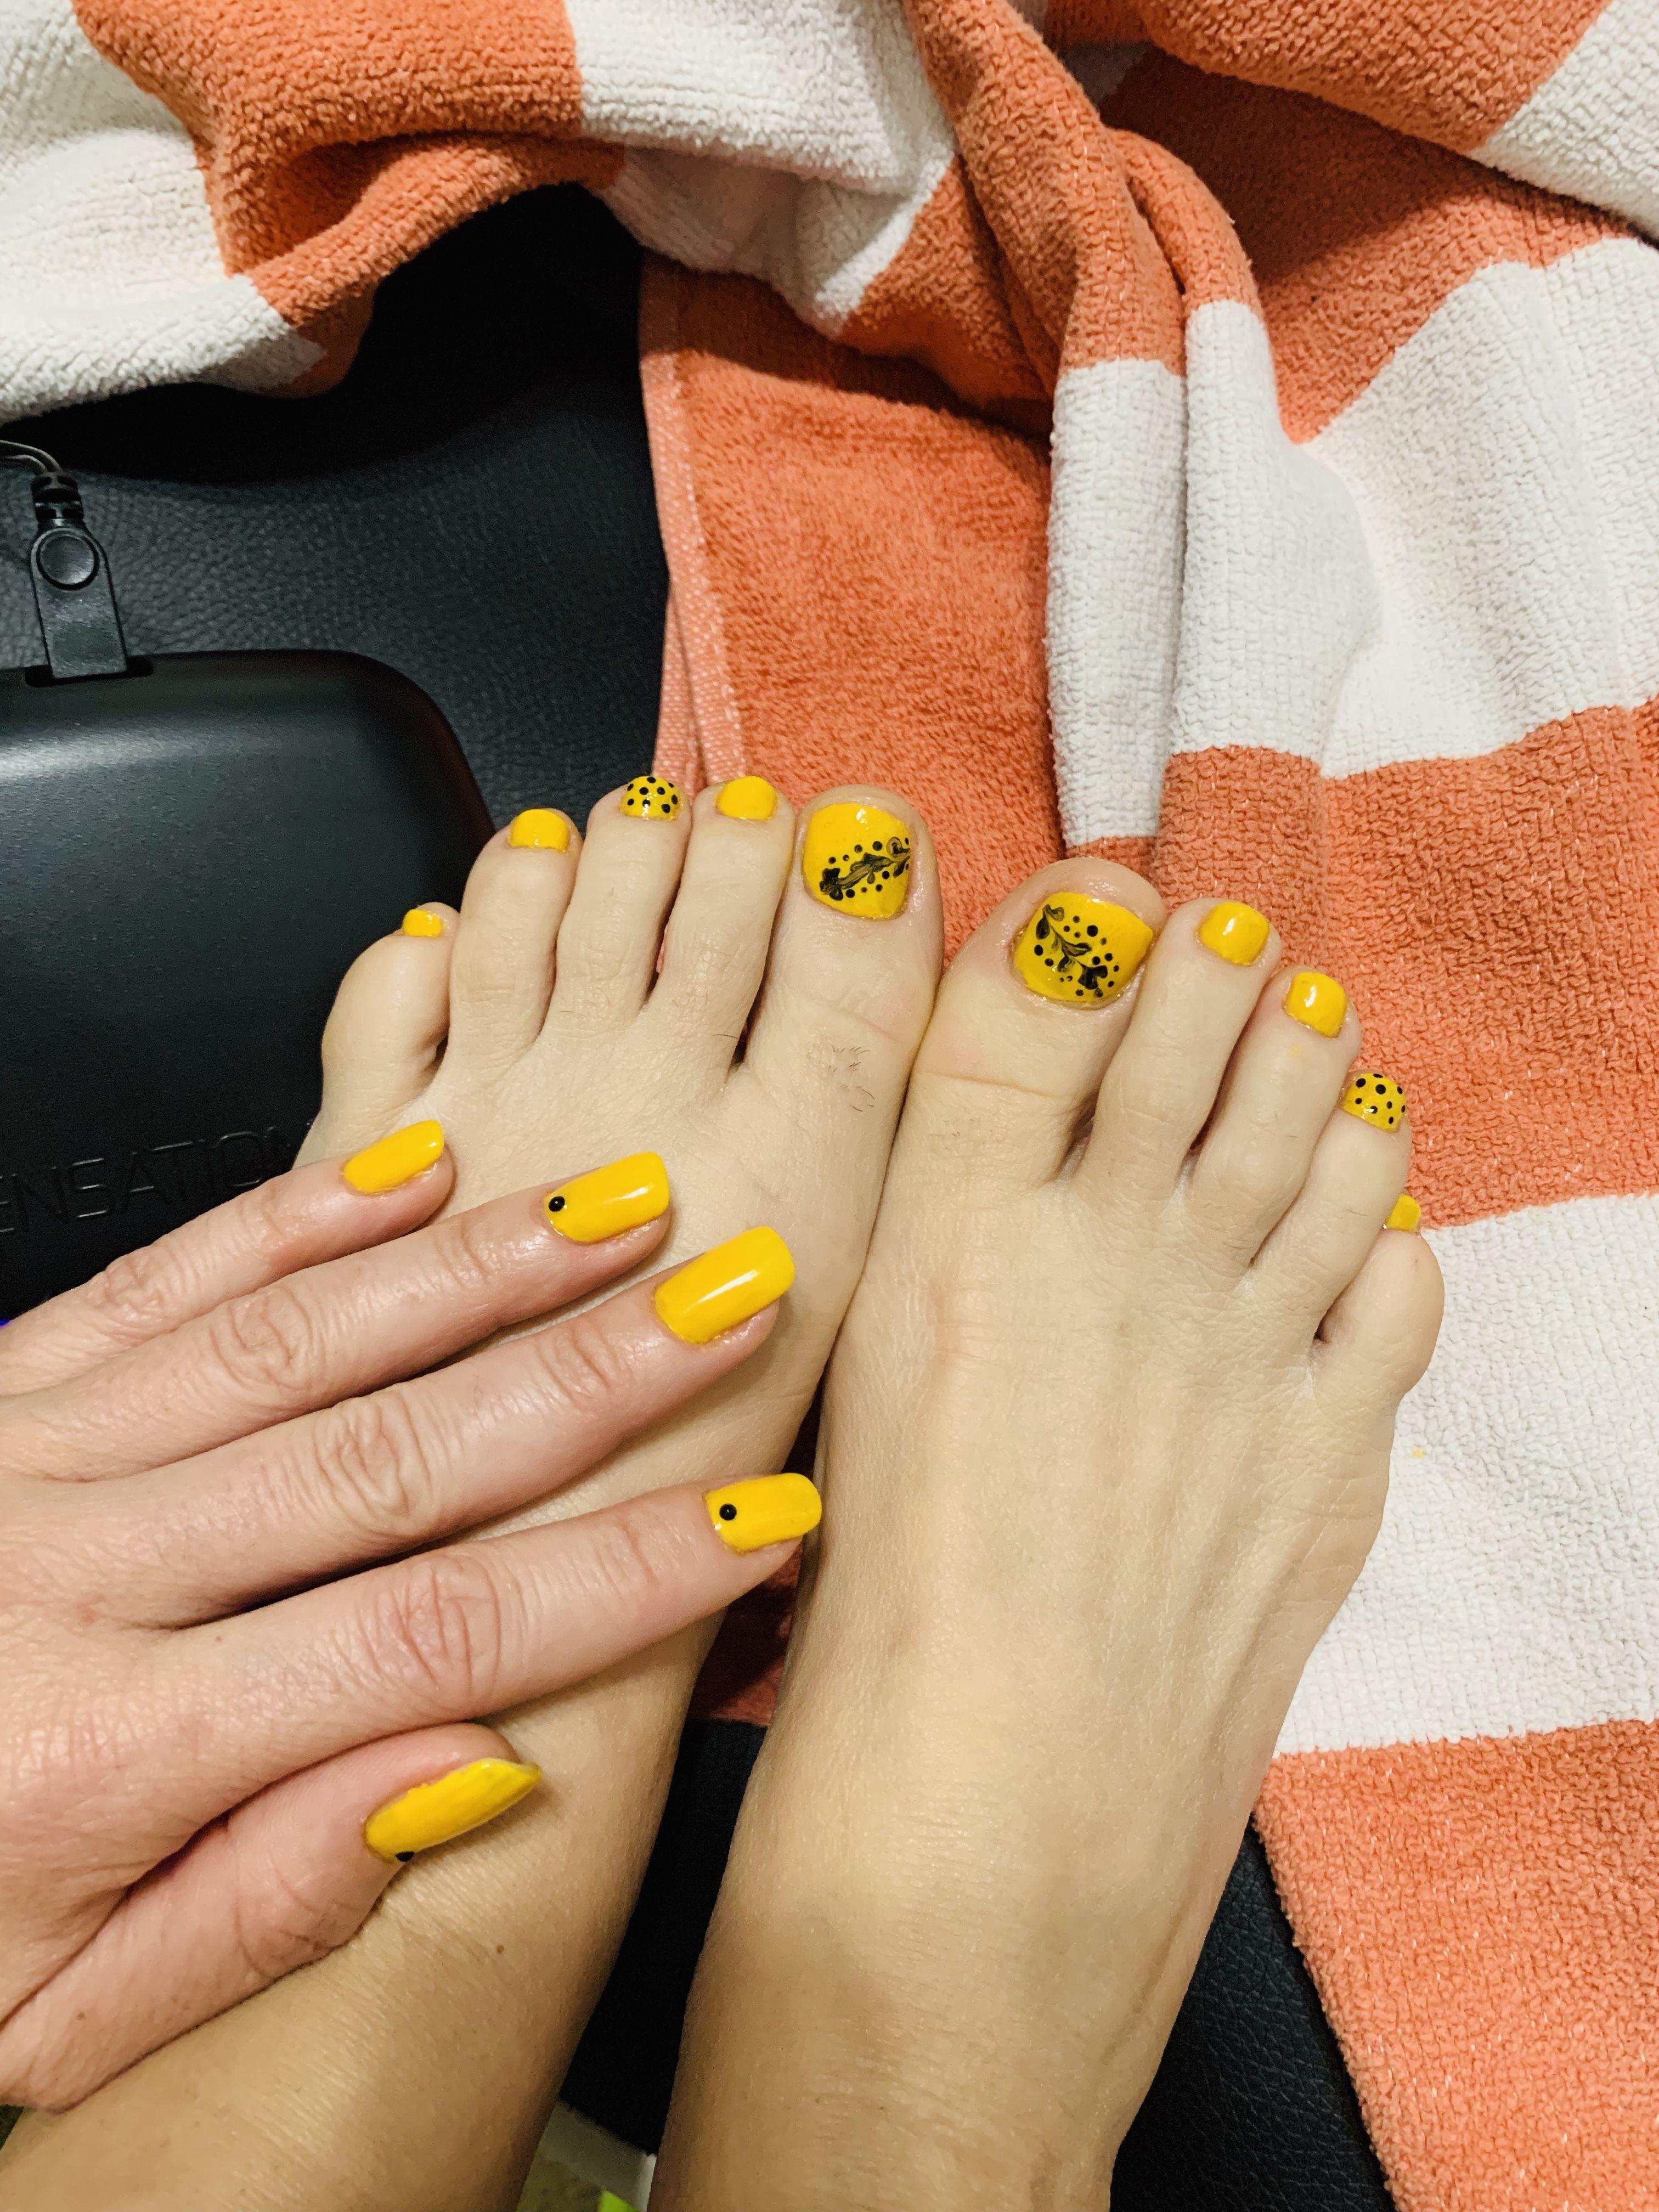 Summer Nails Yellow And Black Nails Design Simple Easy Black Nail Designs Simple Nail Designs Nail Designs